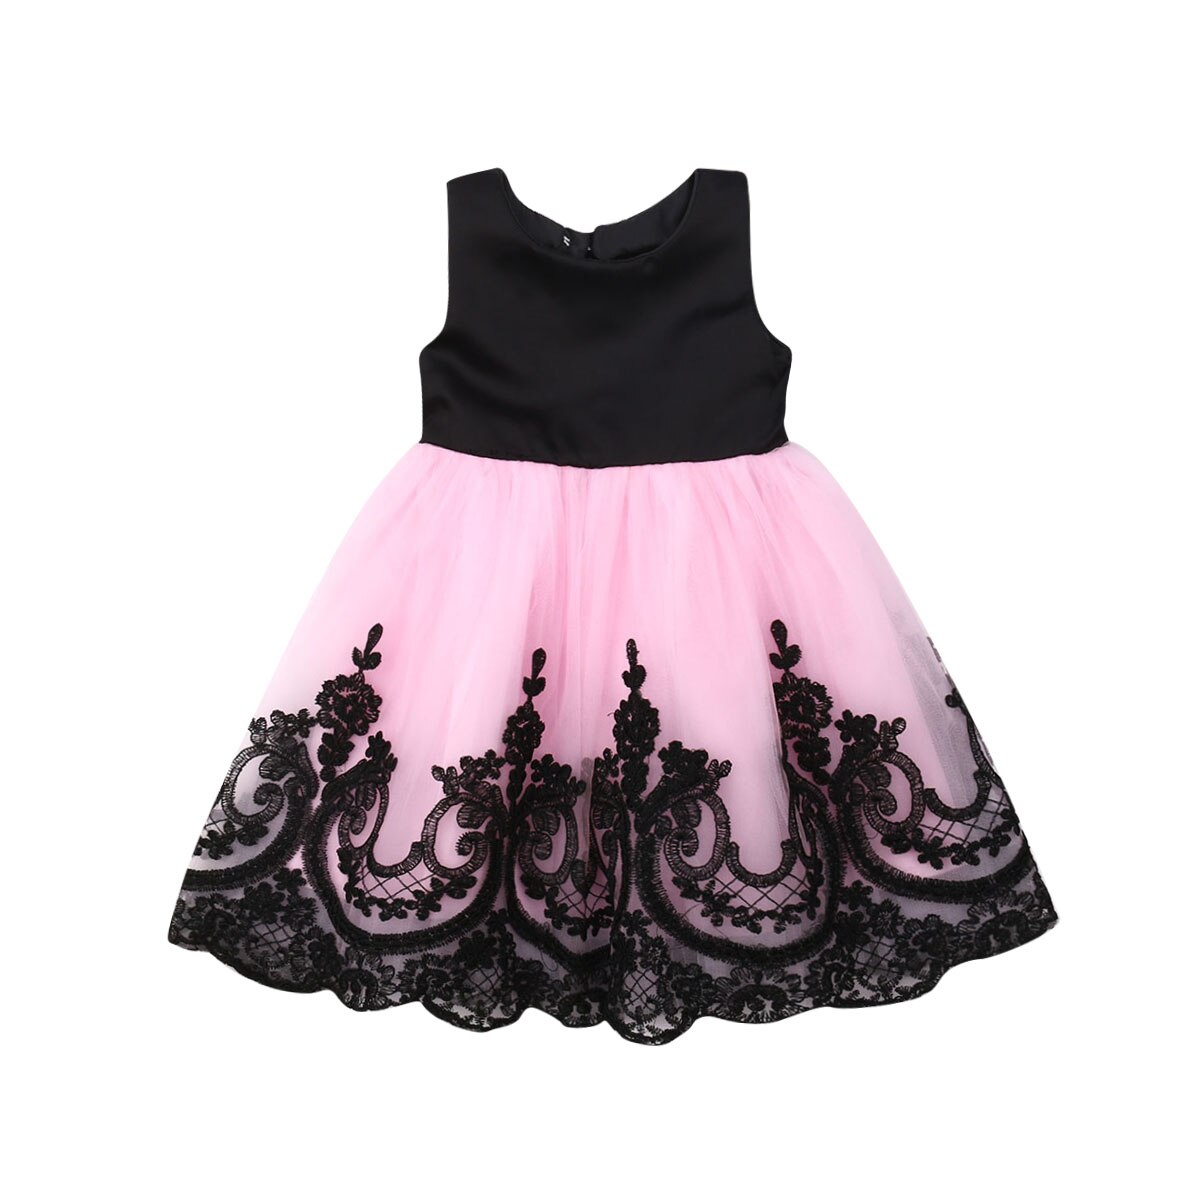 Princesa niños niña vestido sin mangas lazo trasero encaje tutú vestido de bola Formal desfile vestidos de fiesta ropa